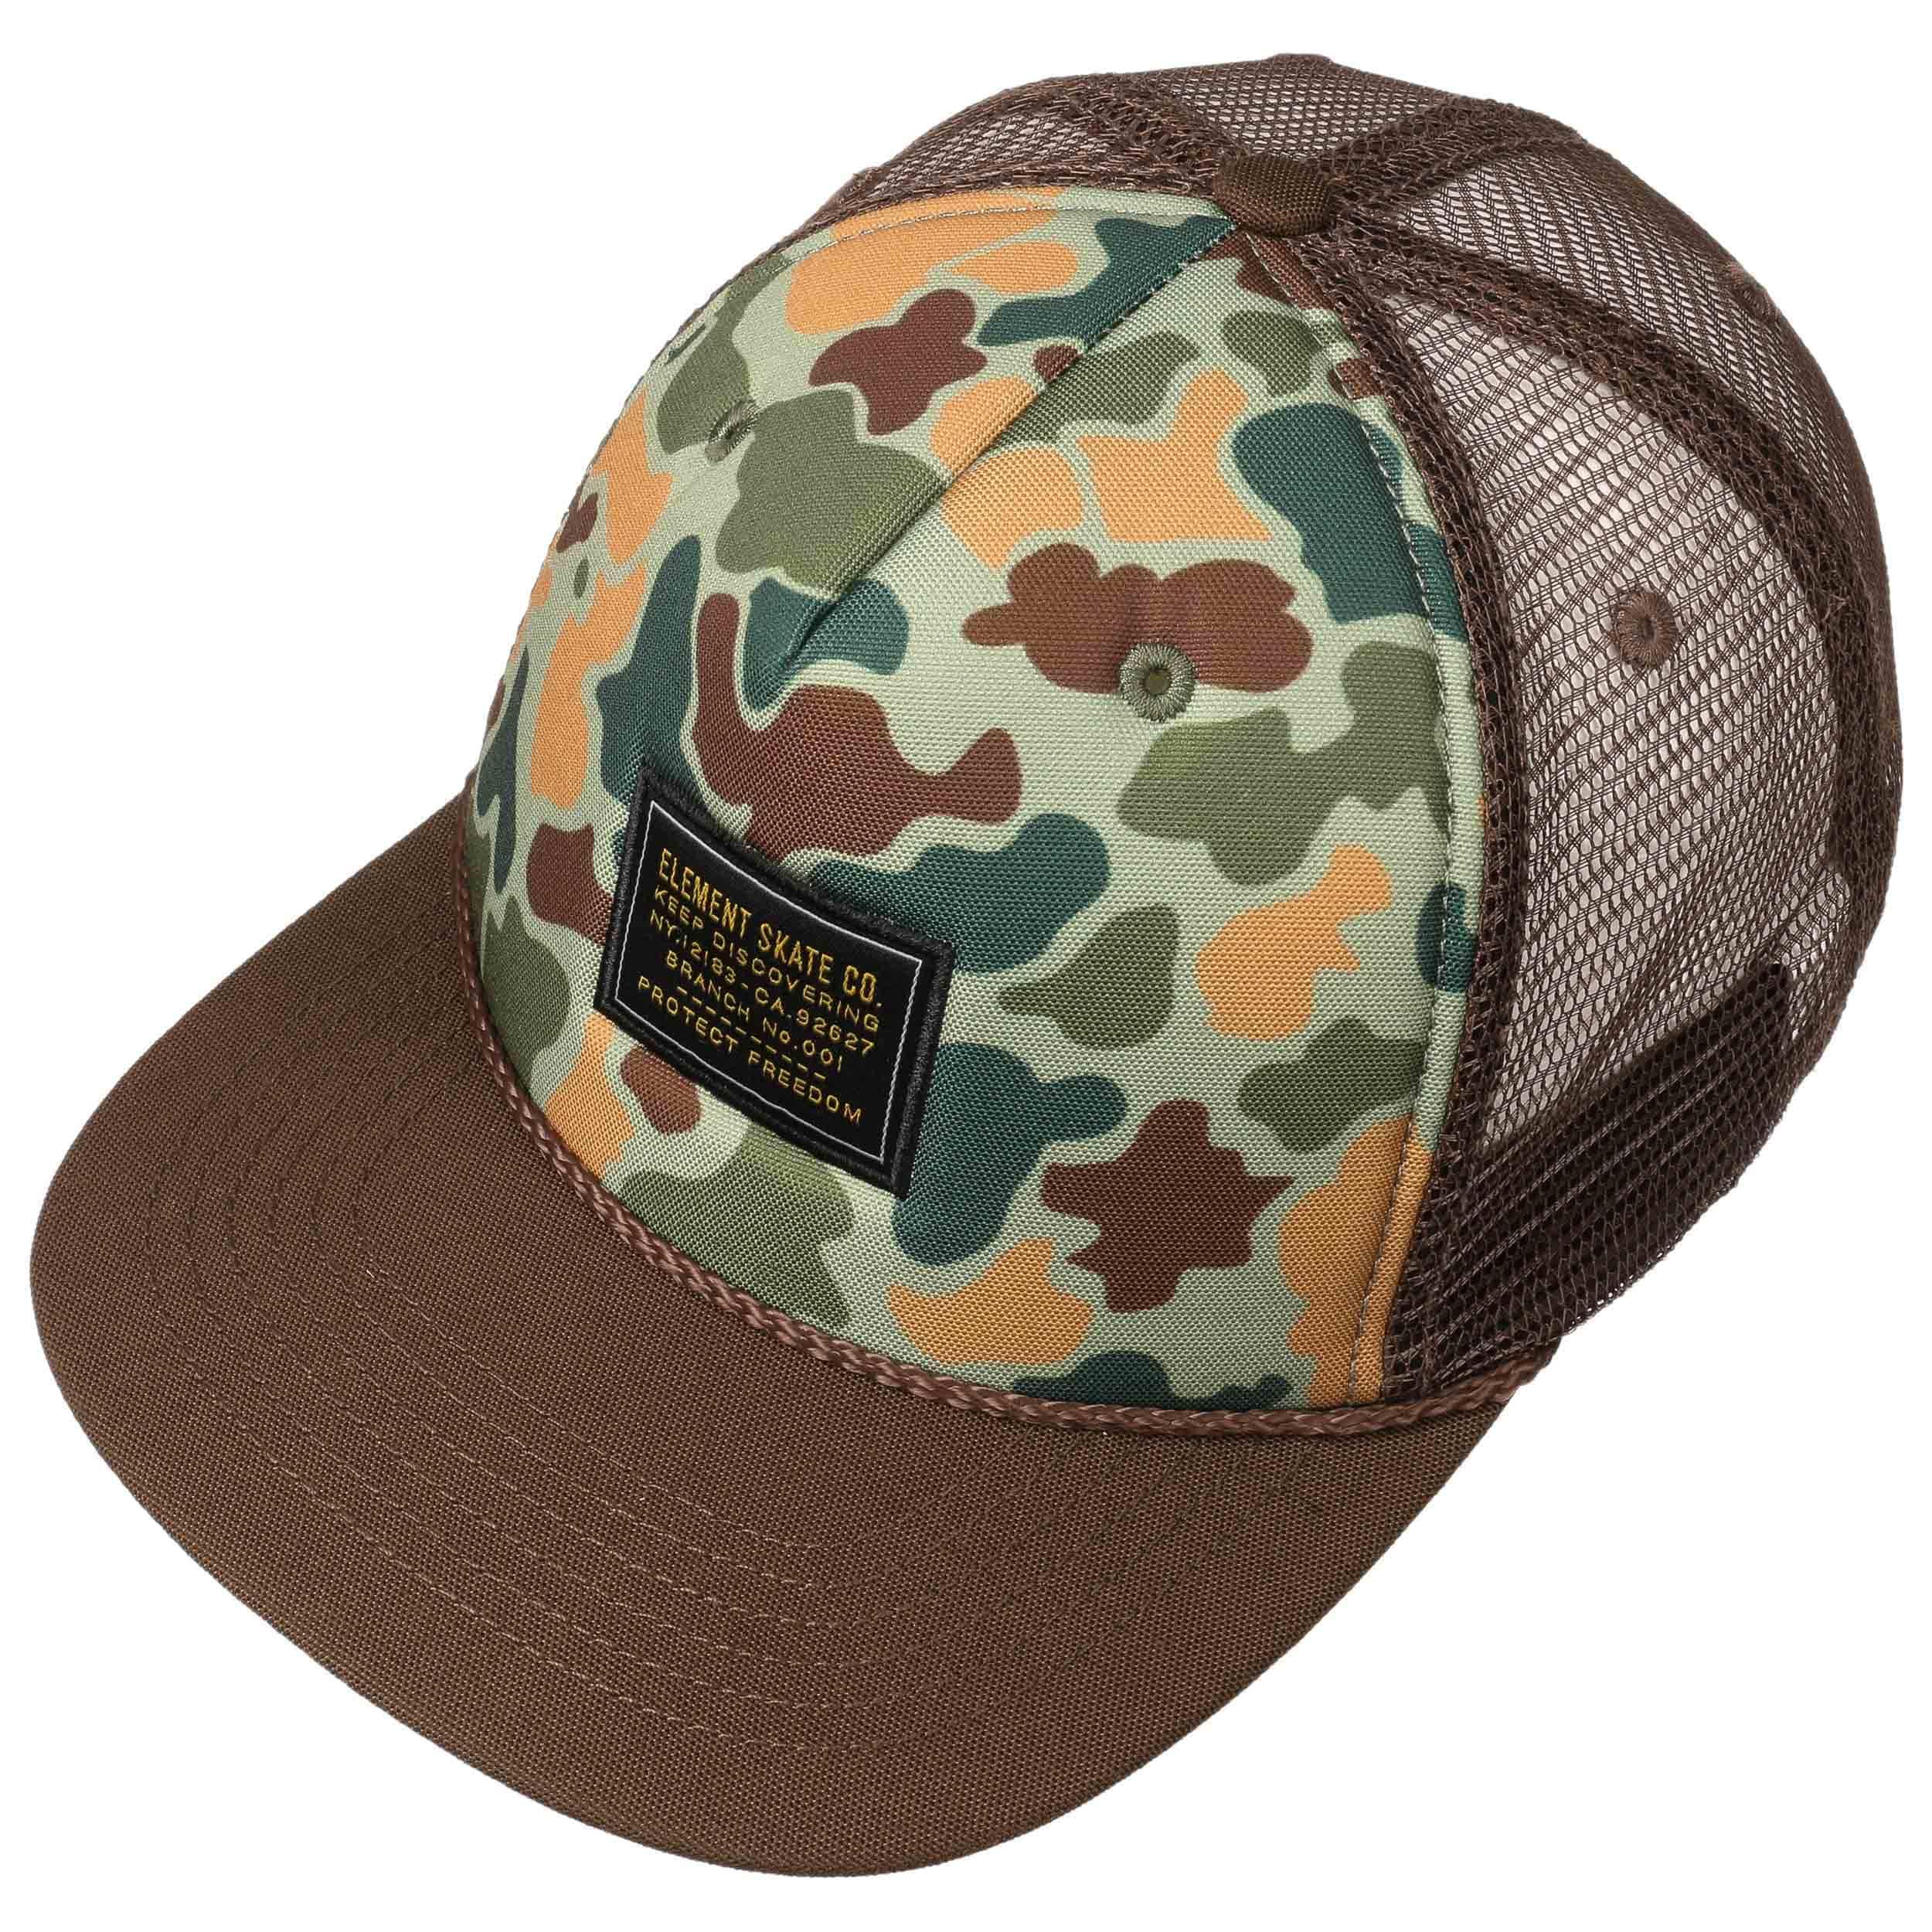 Gorra Legion Trucker by element - Gorras - sombreroshop.es d39aa15c2b2